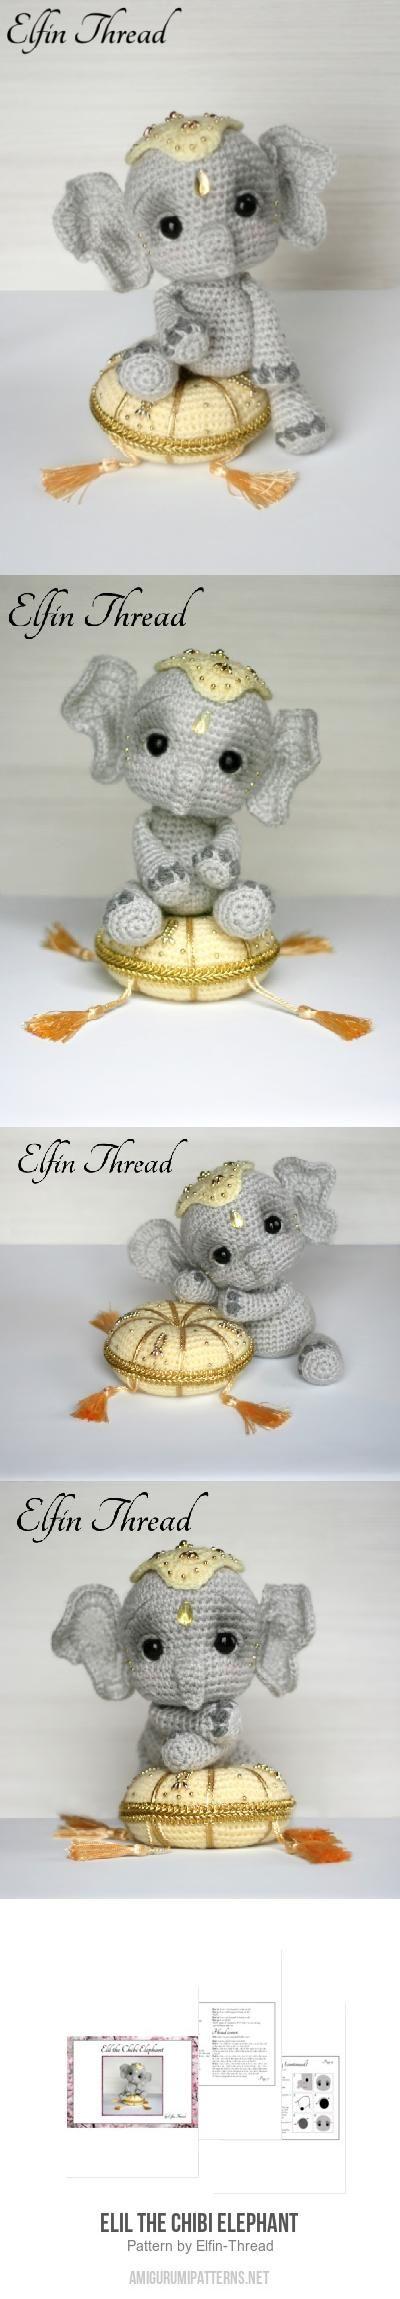 Elil the Chibi Elephant amigurumi pattern